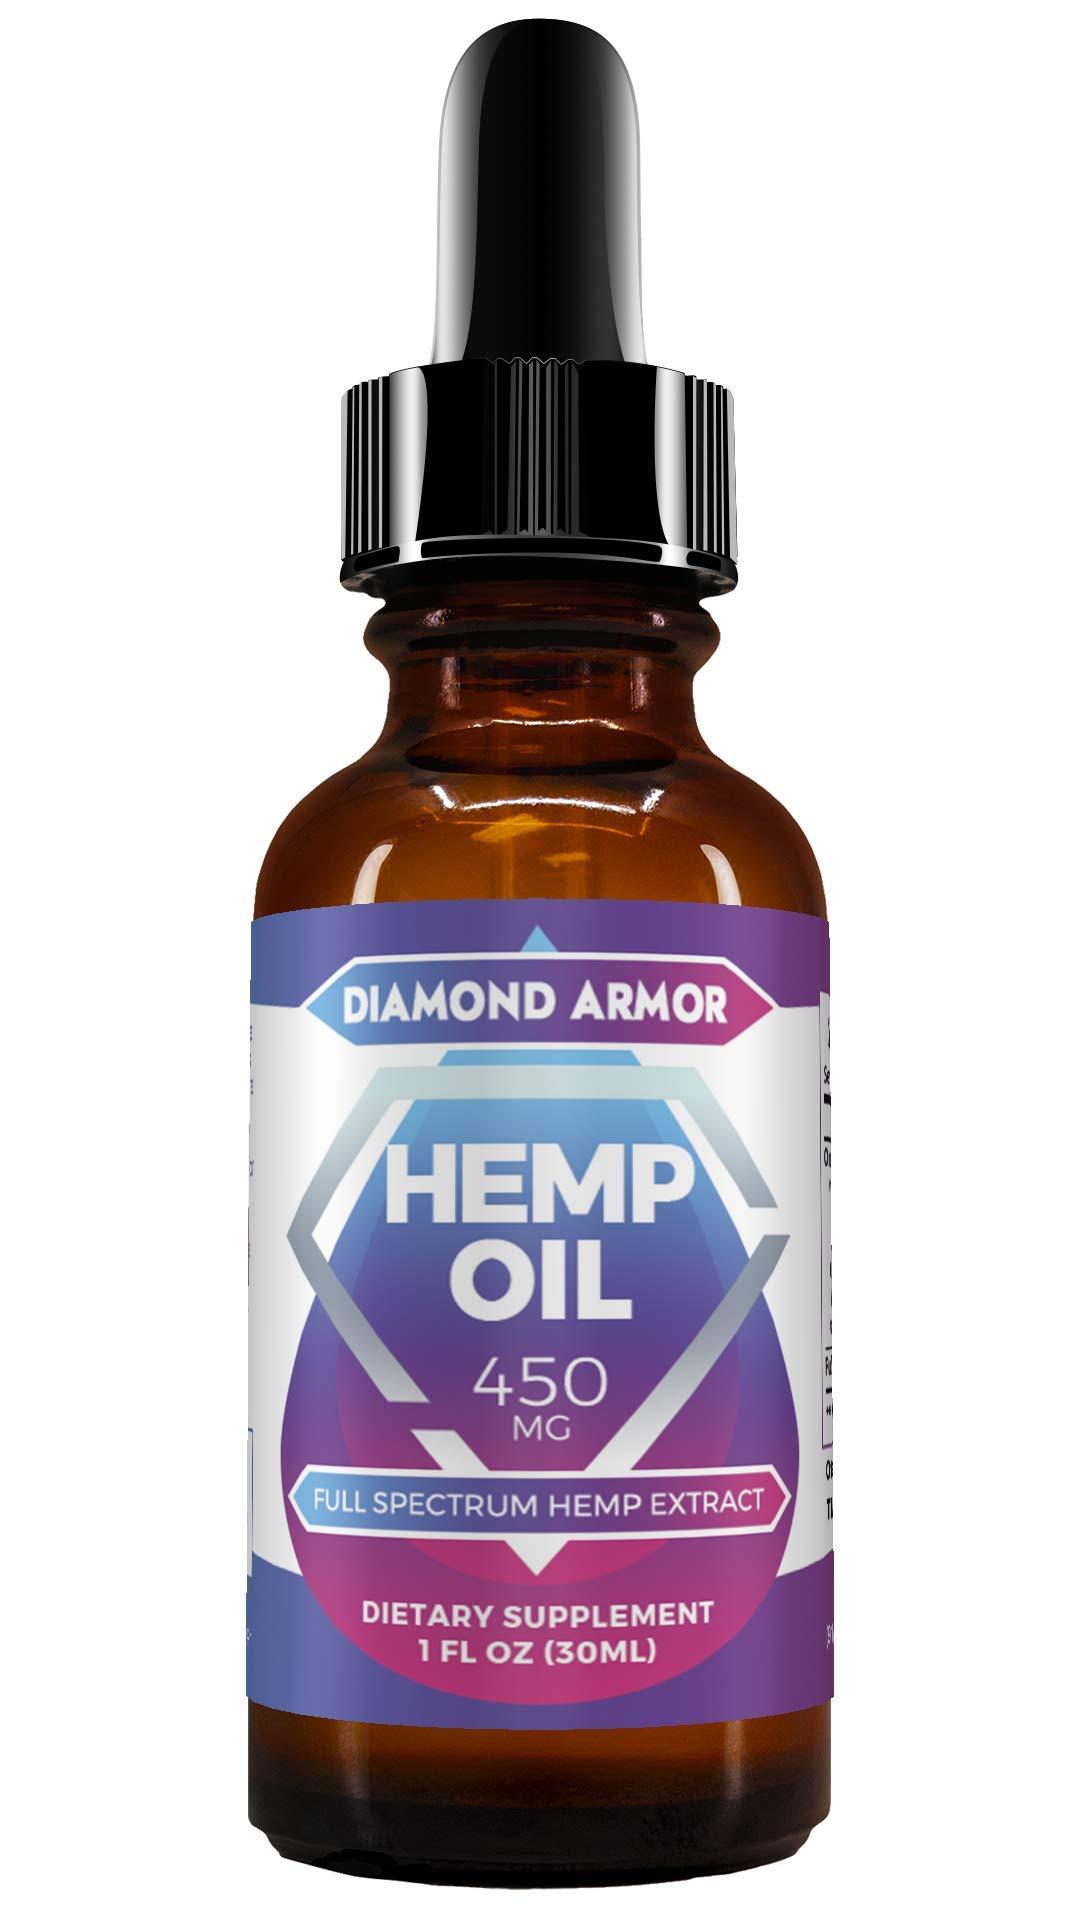 Full Spectrum Hemp Seed Oil Drops - 450mg | Promotes Anxiety Relief, Reduces Stress & Chronic Pain, Anti-Inflammatory & Sleep Aid with Omega 3, 6 & 9 Oils | ZeroTHC CBD Cannabidiol - Mint Flavor by Diamond Armor